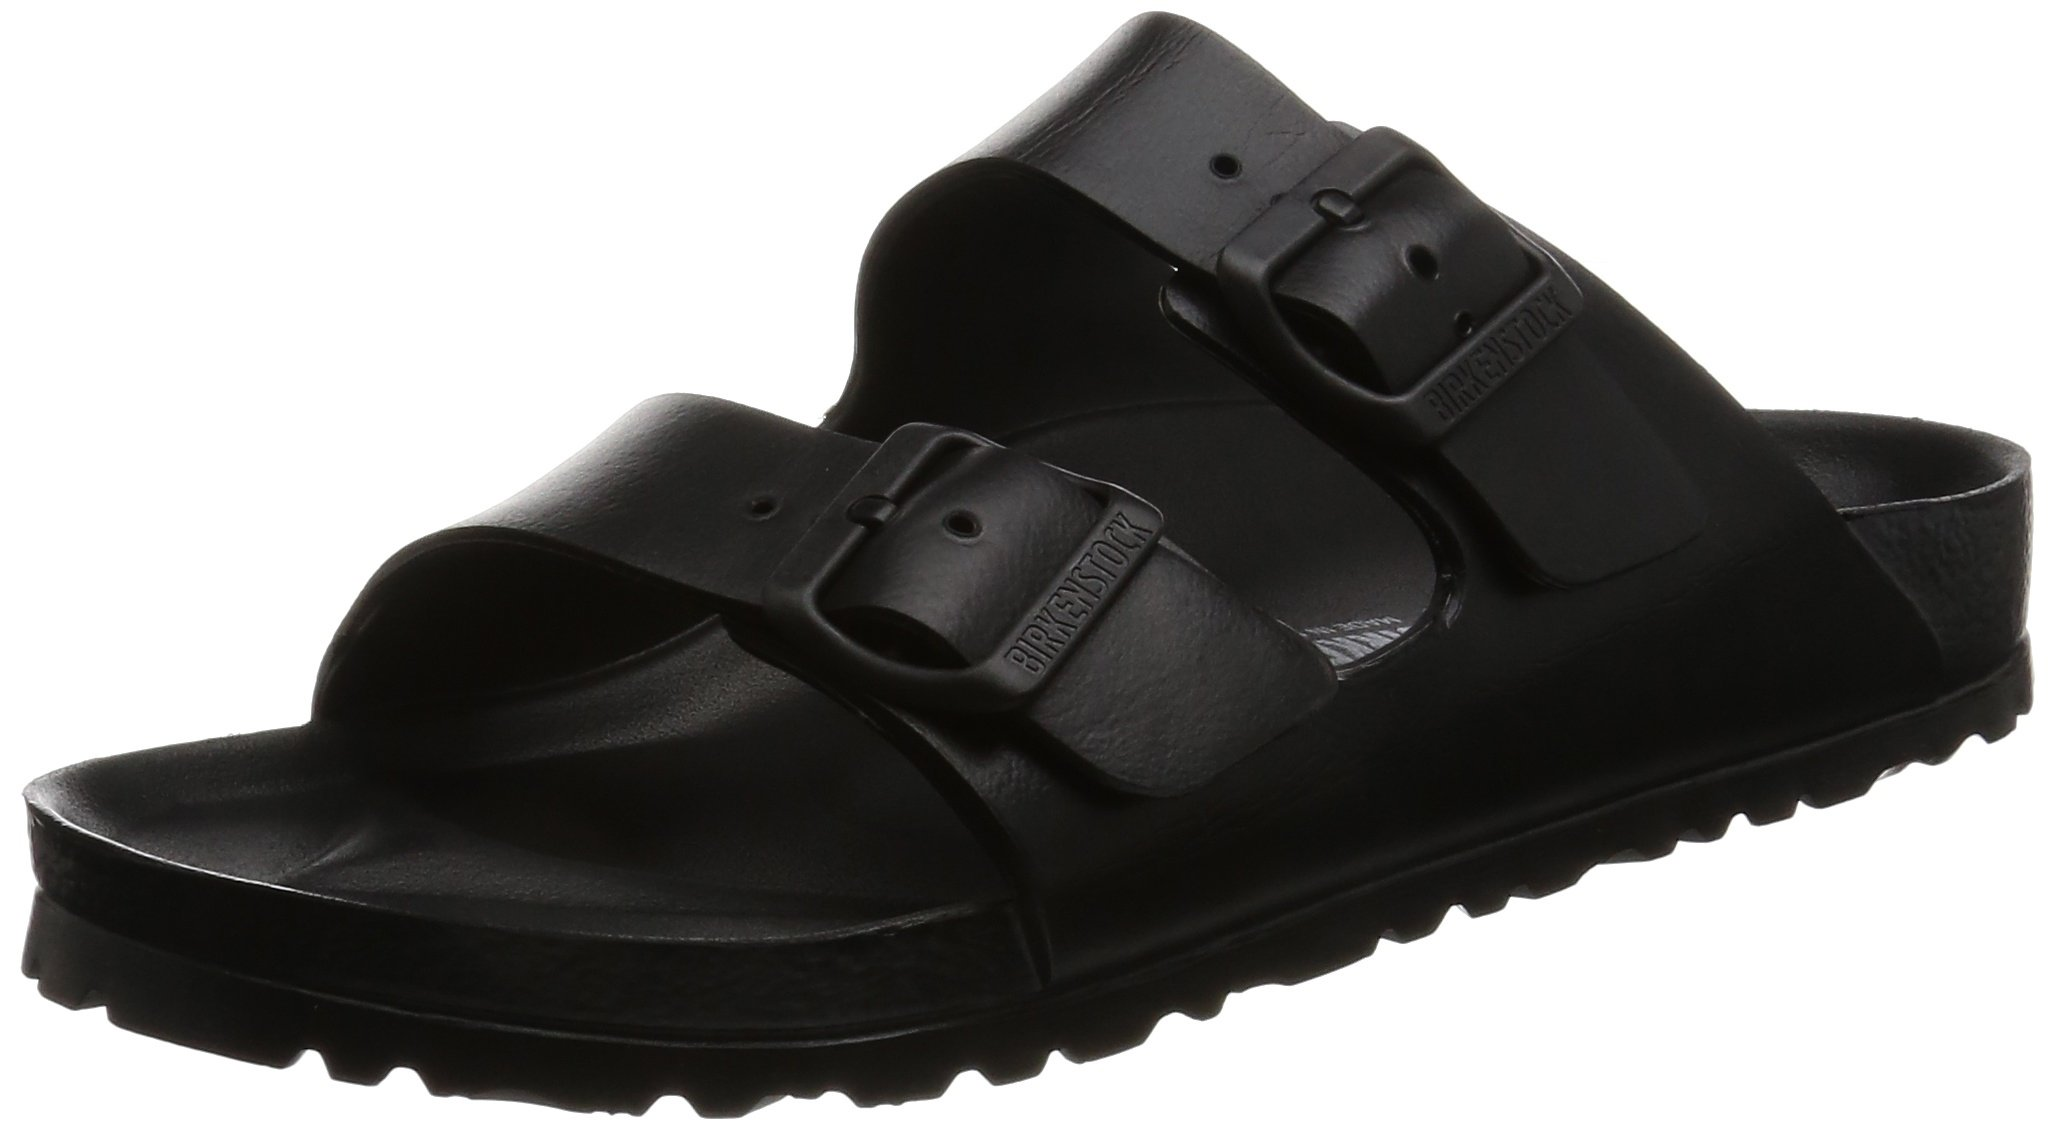 Birkenstock Unisex Arizona Essentials EVA Black Sandals - 40 N EU / 9-9.5 2A(N) US